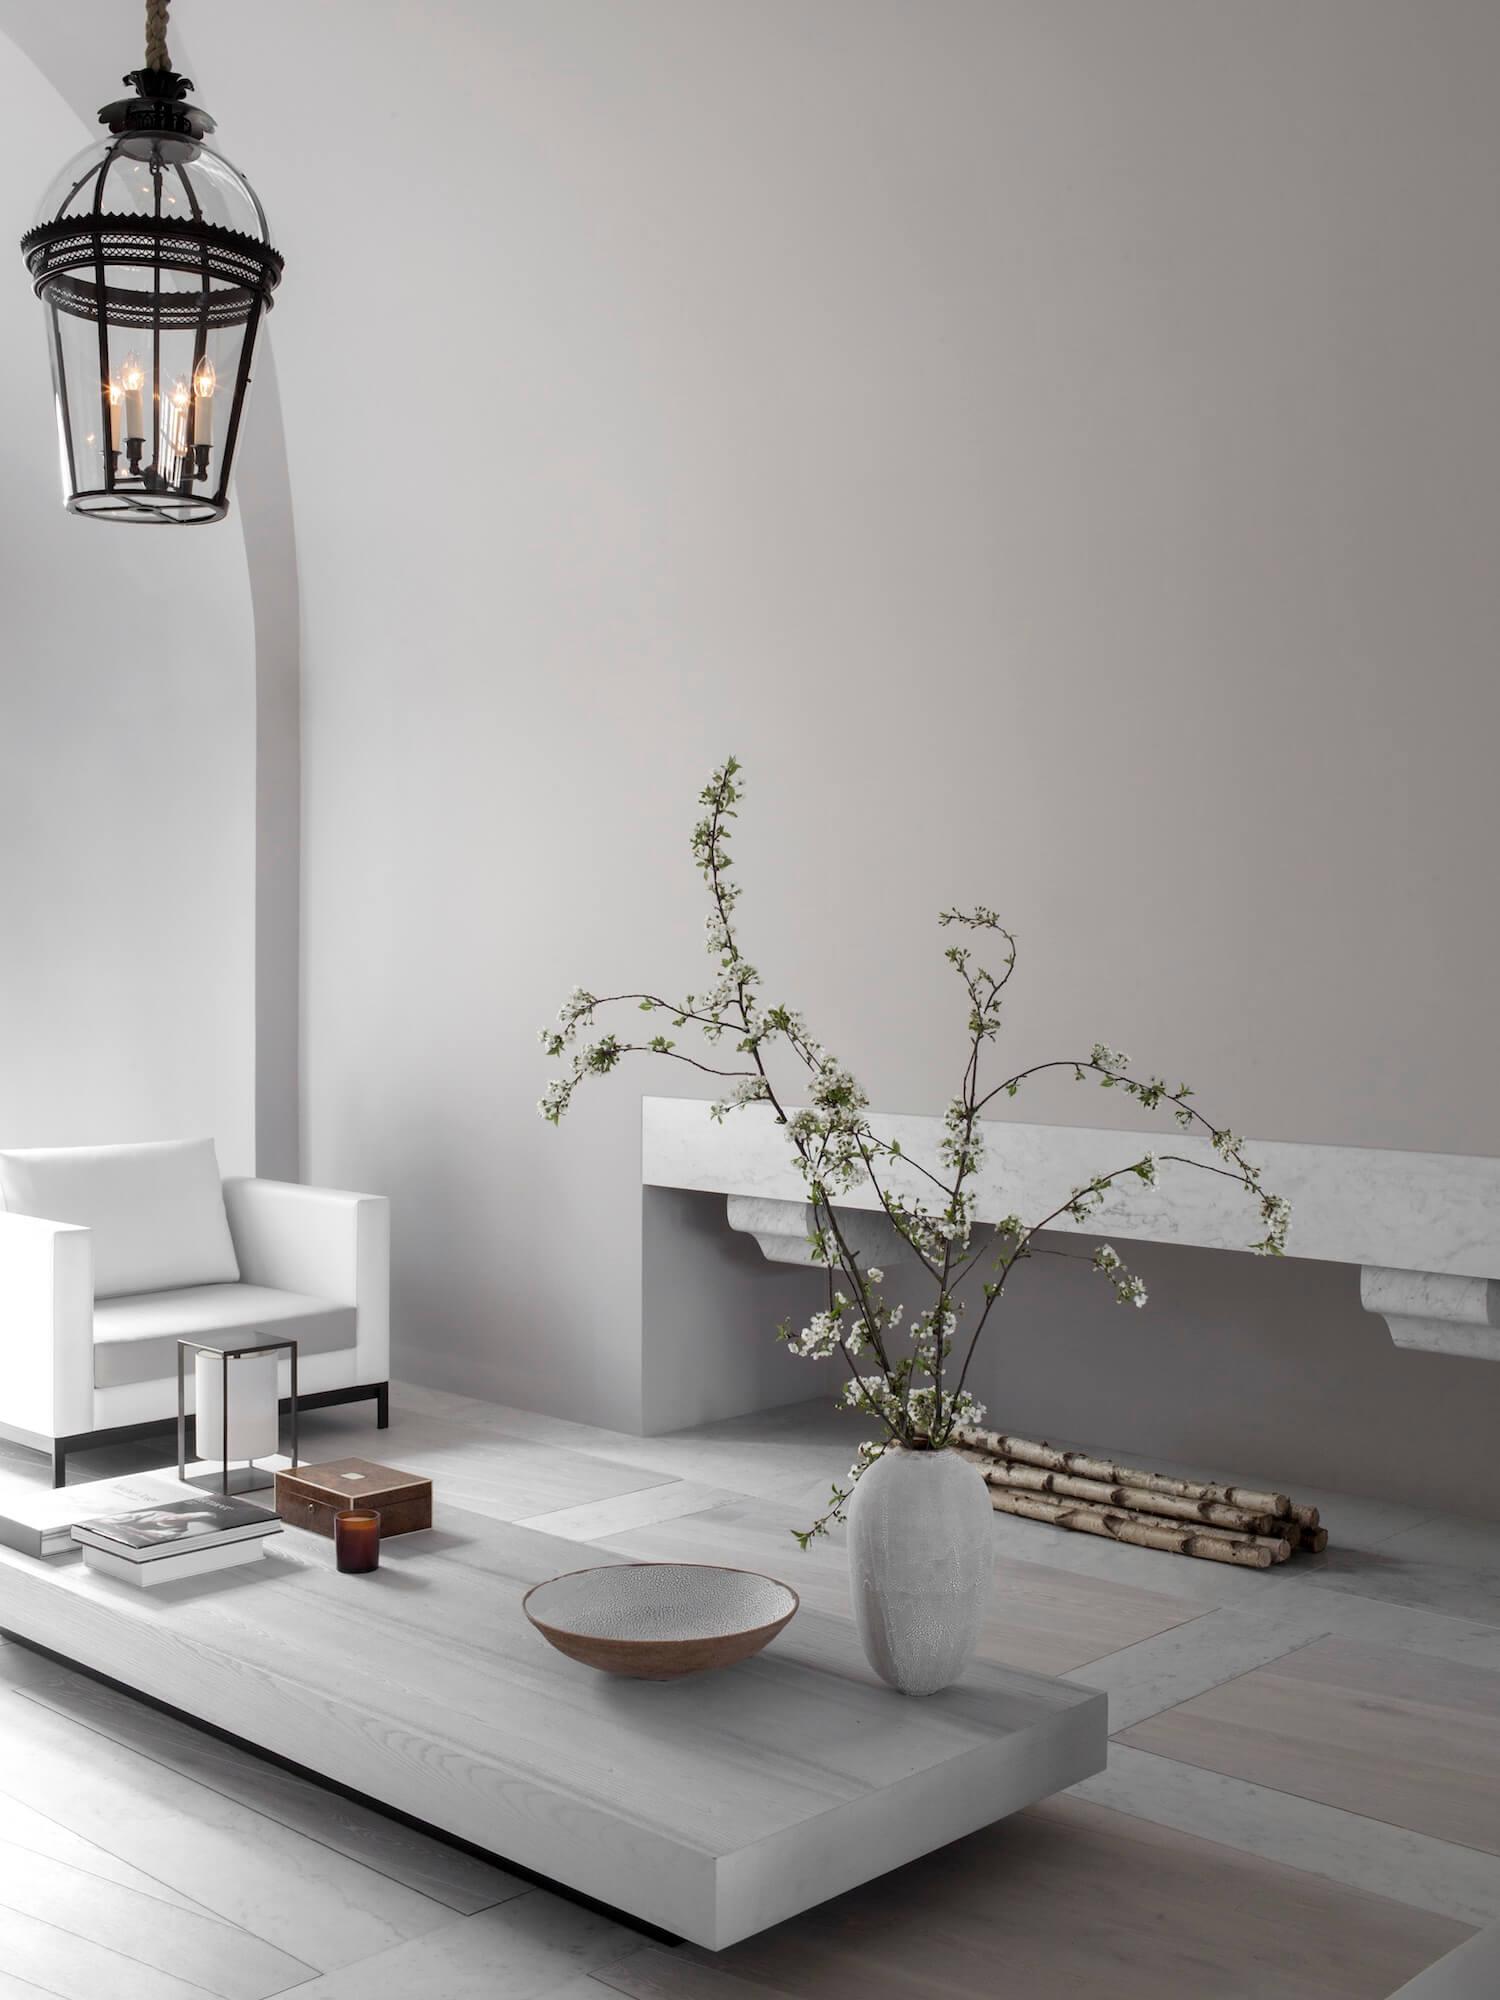 phong cách tối giản elledecoration vietnam-paris-apartment-guillaume-alan2